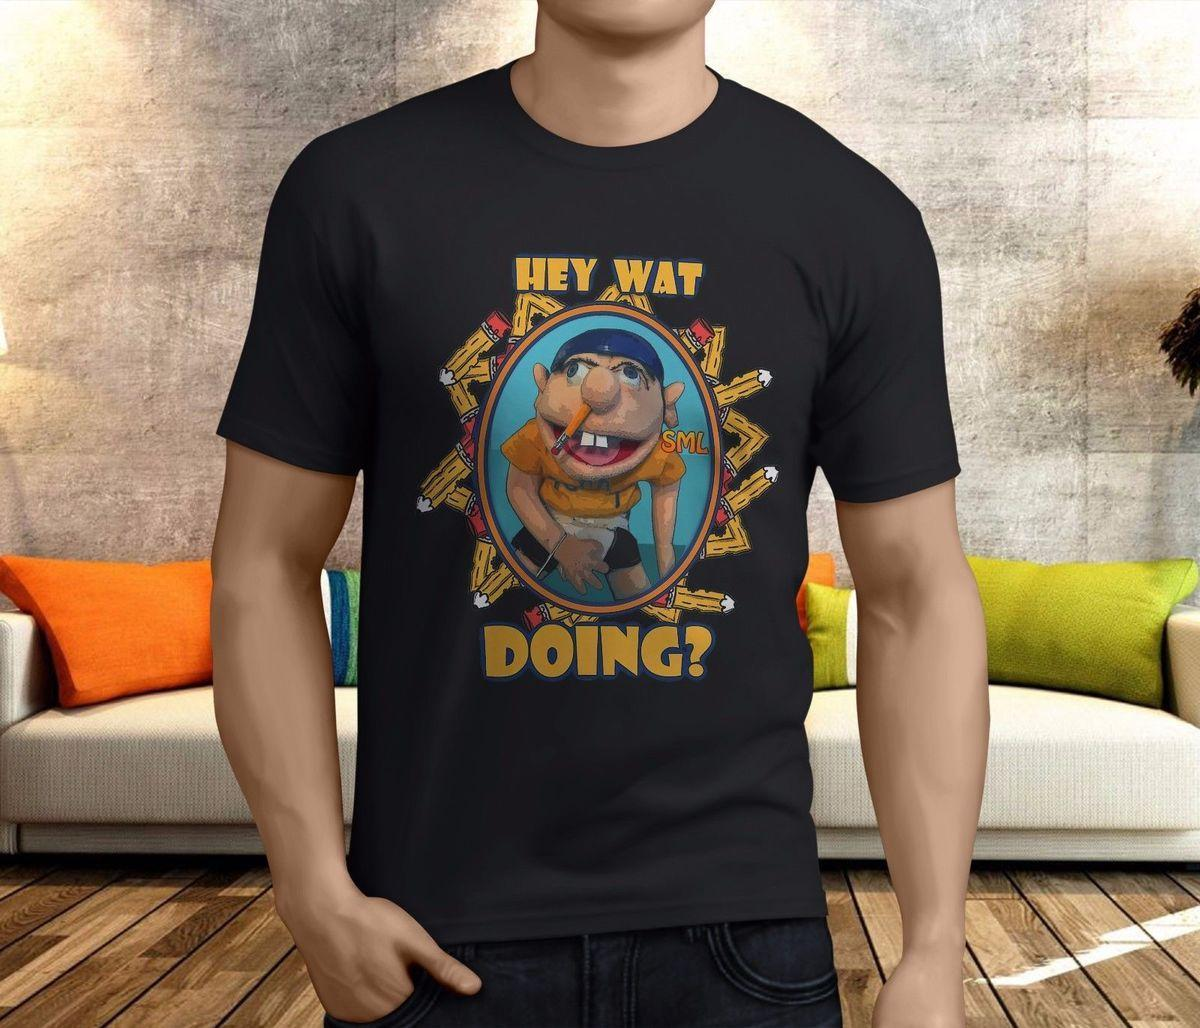 65dea5751162 New Cool SML JEFFY Youth Men'S Black T Shirt Size S 3XL Create T ...